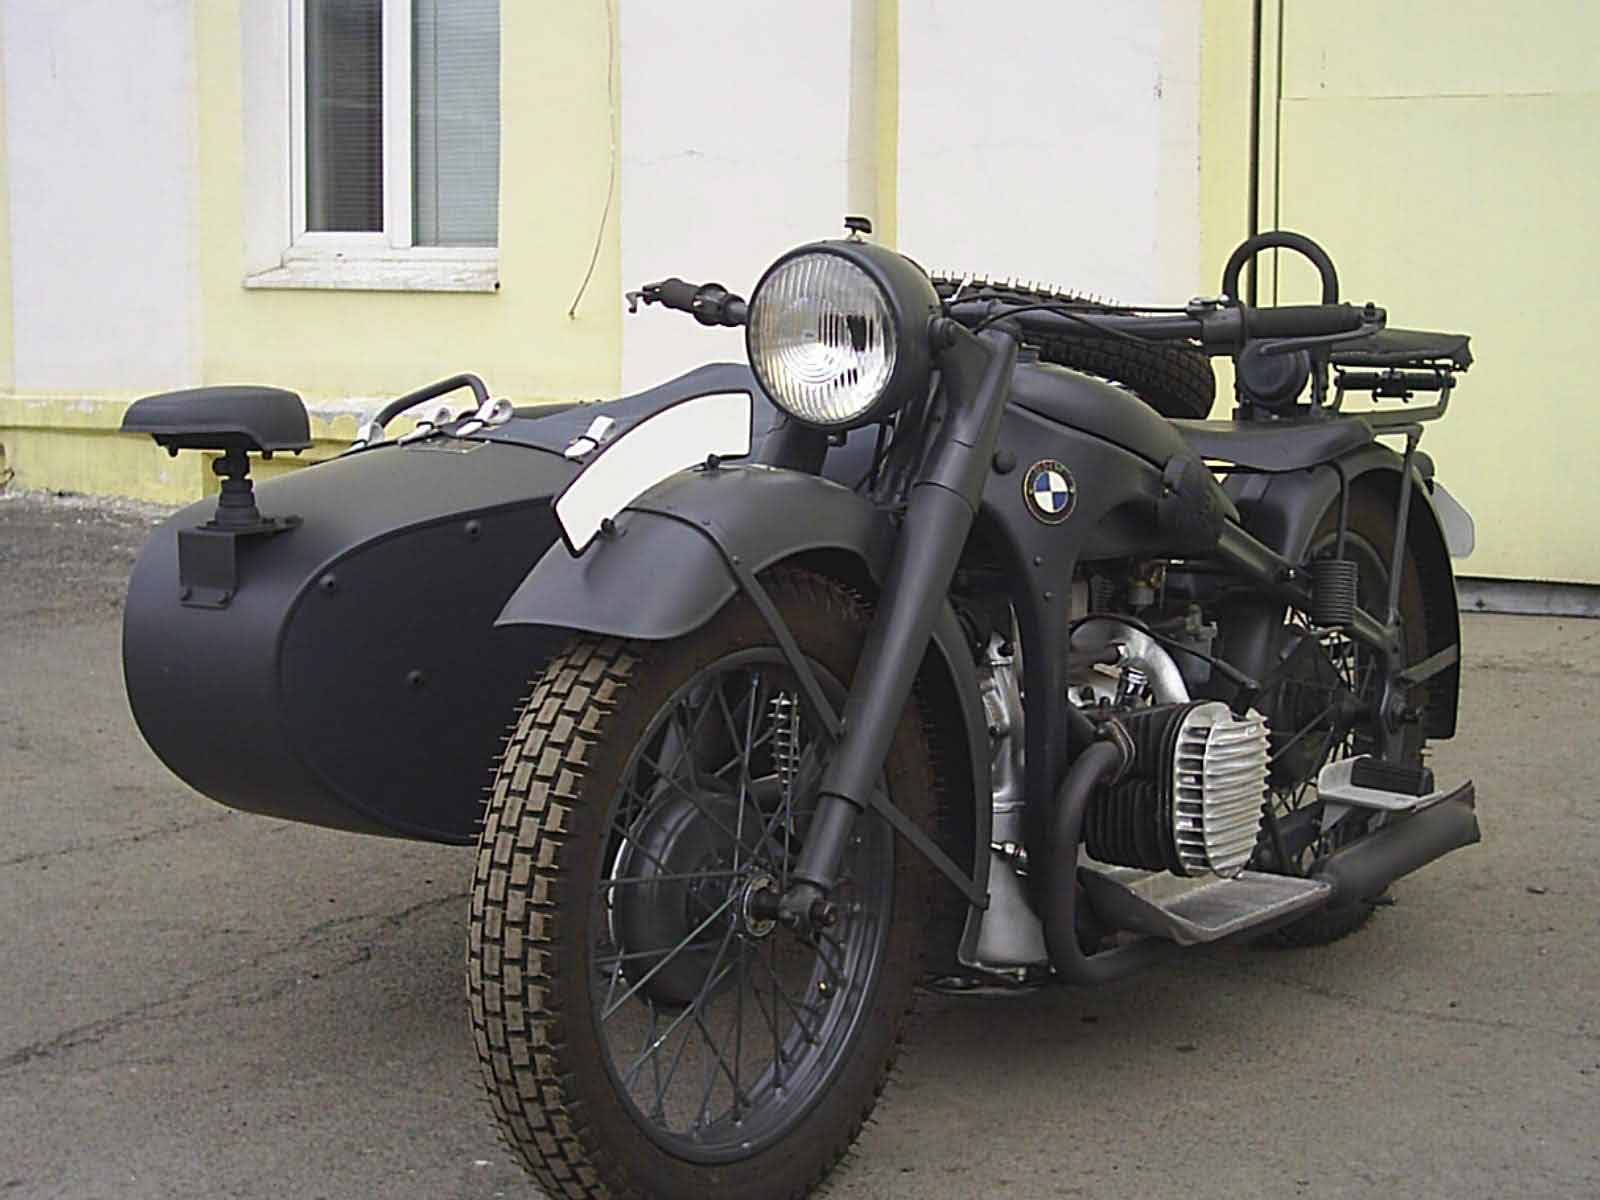 Мотоциклы БМВ военных лет #10